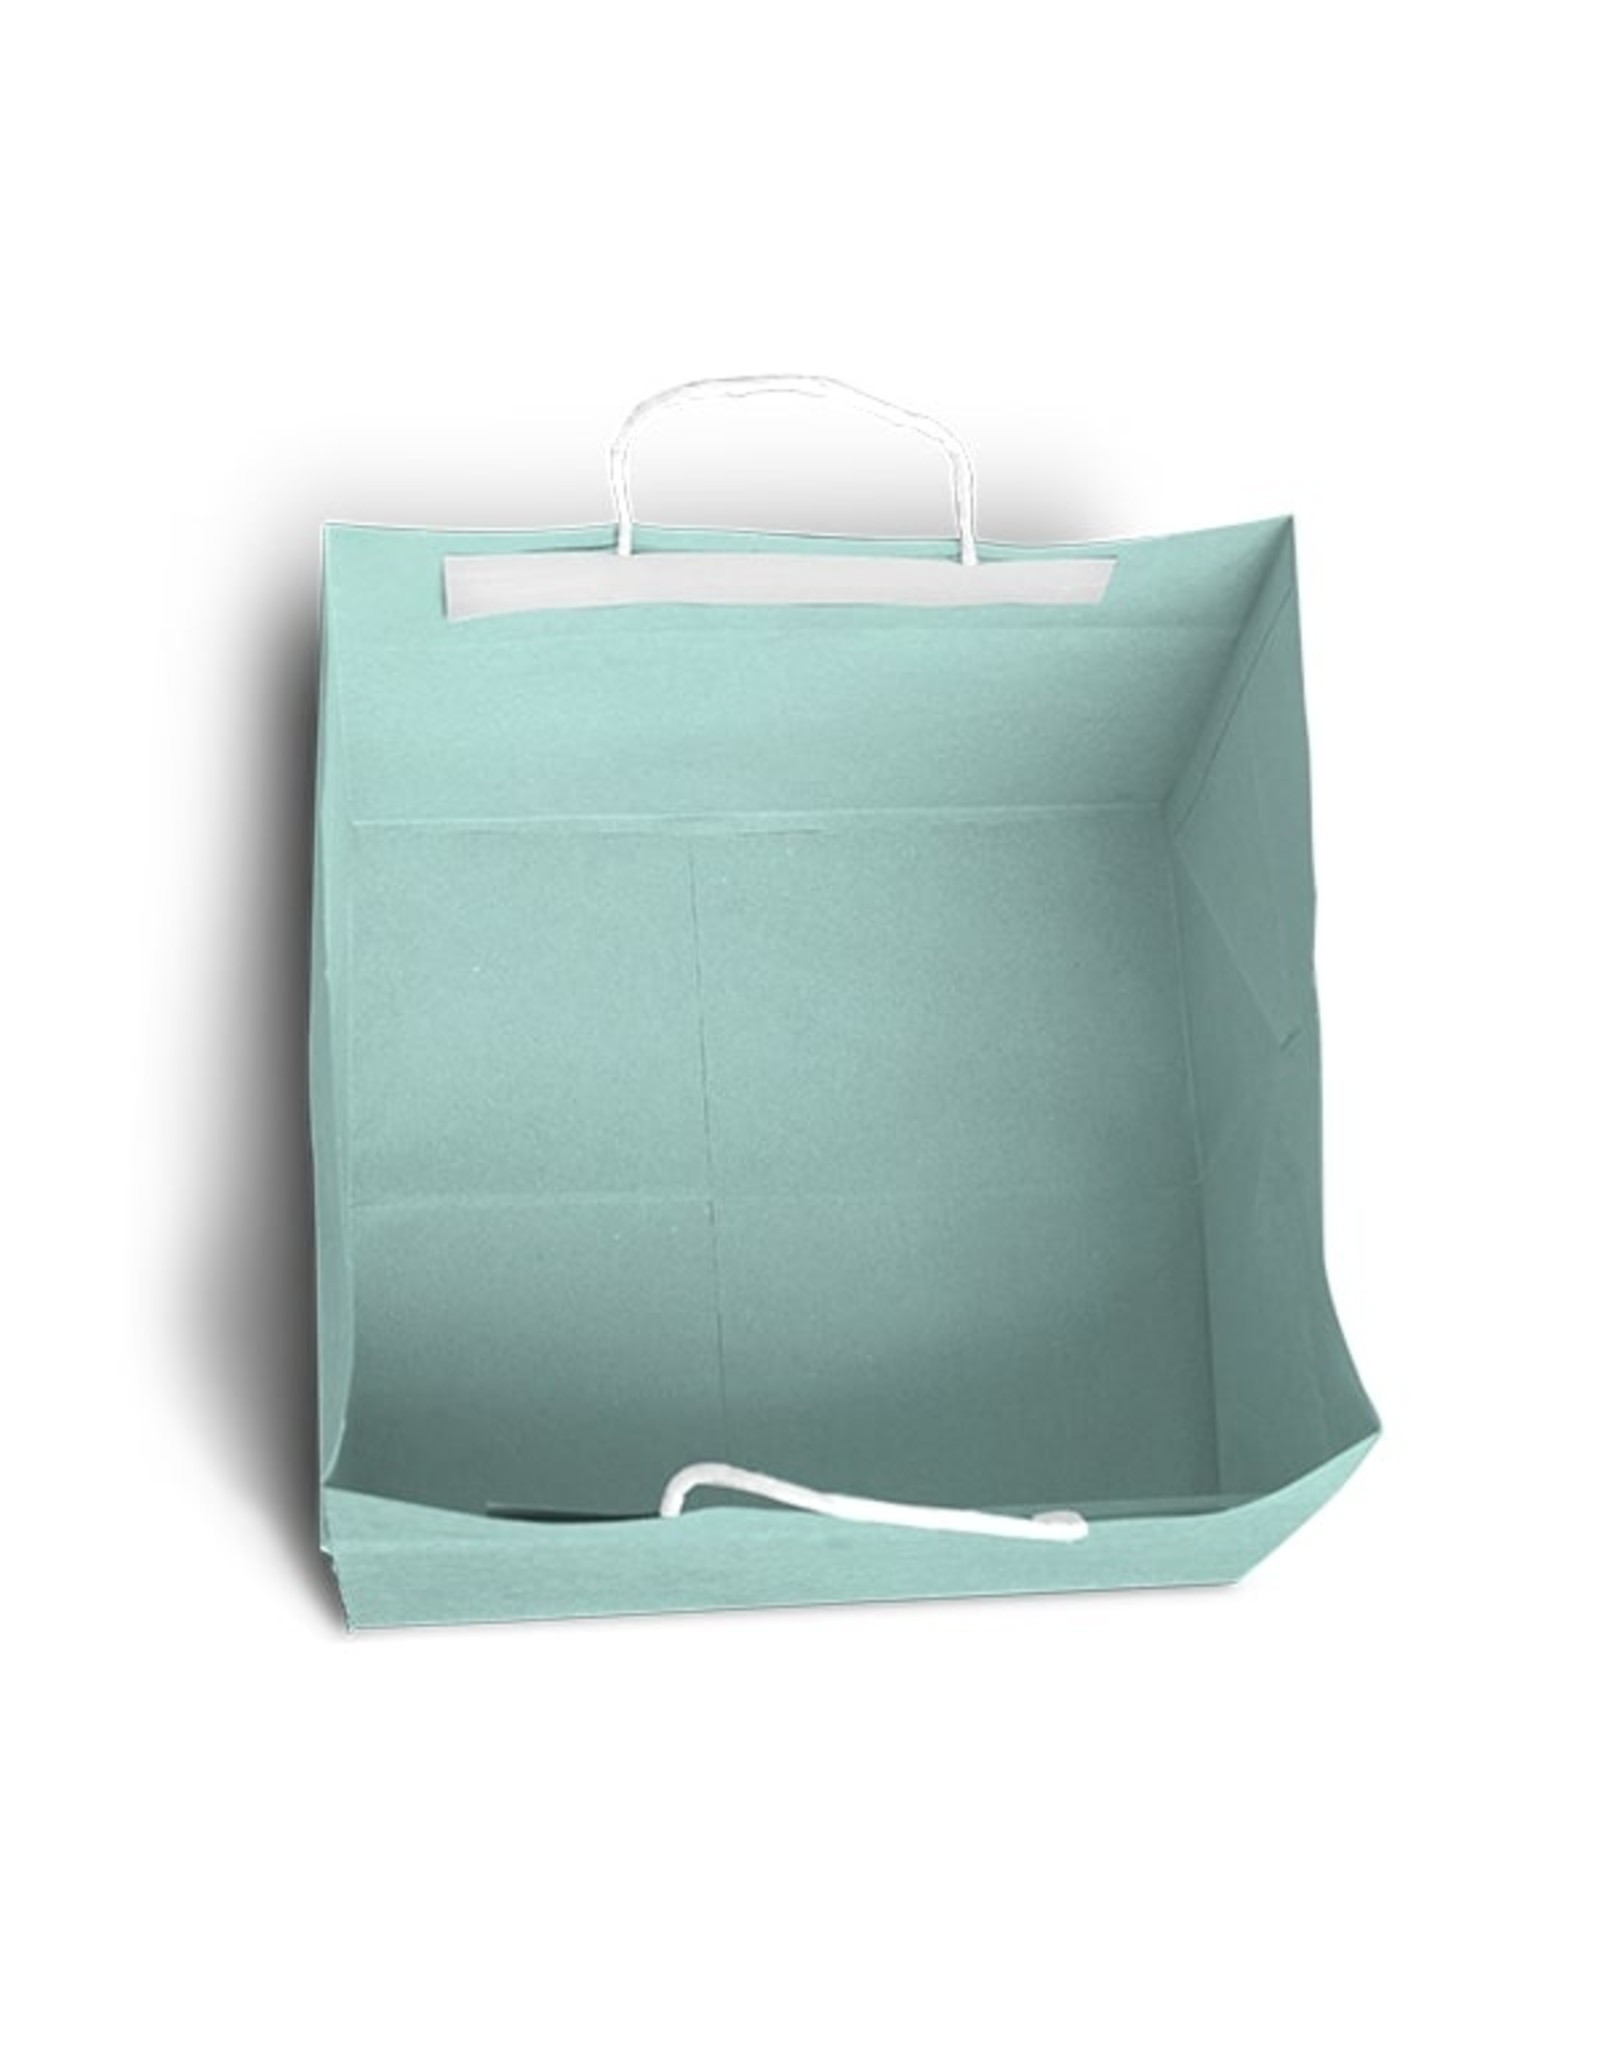 Mint tas - groot (per 10 stuks)